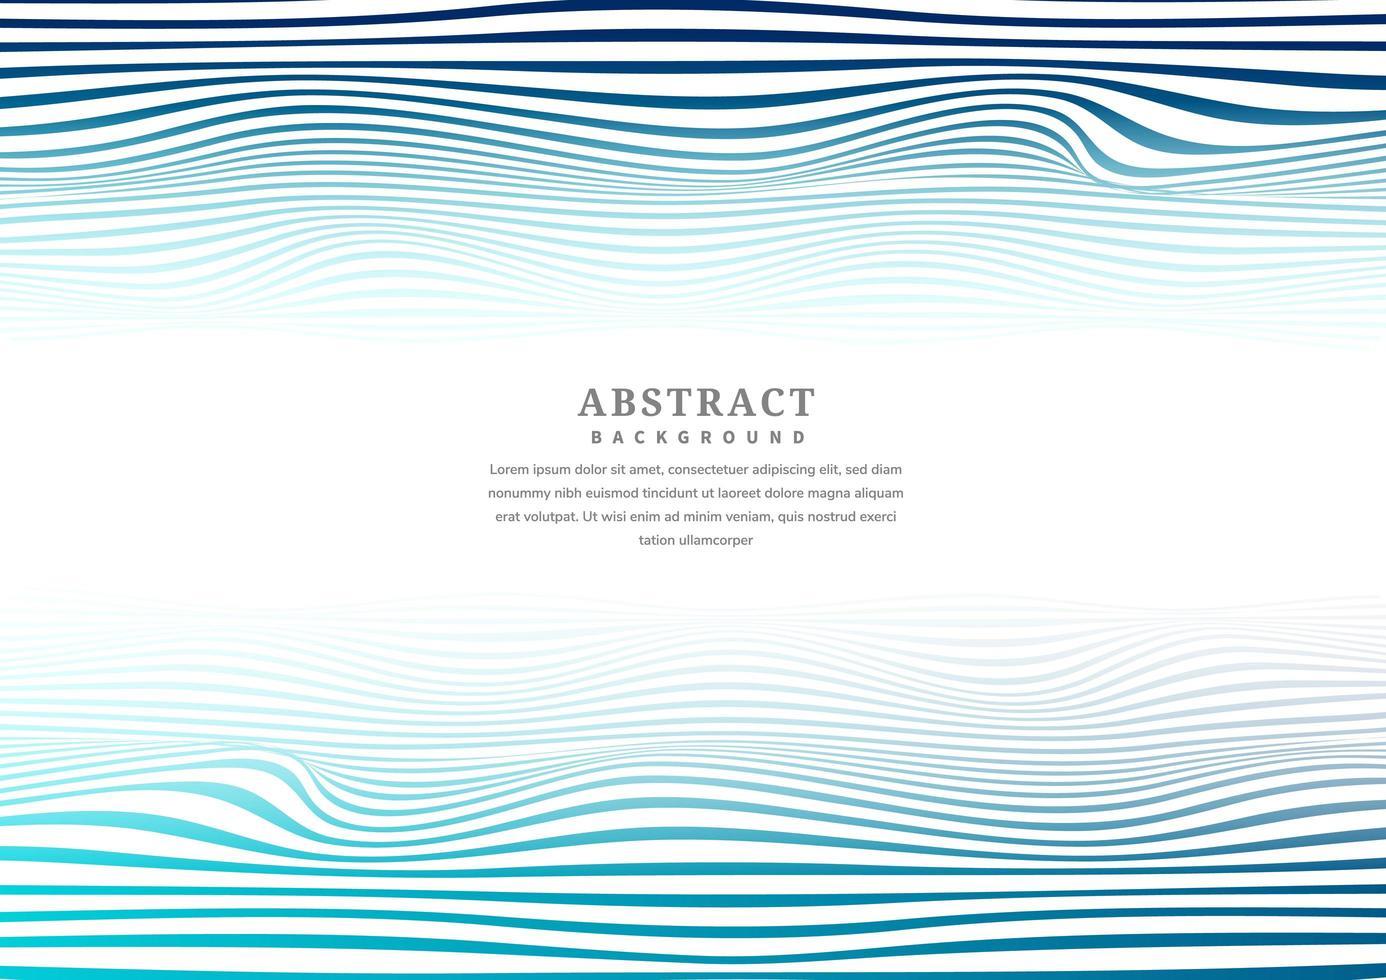 linee blu astratte e motivo a strisce d'onda vettore